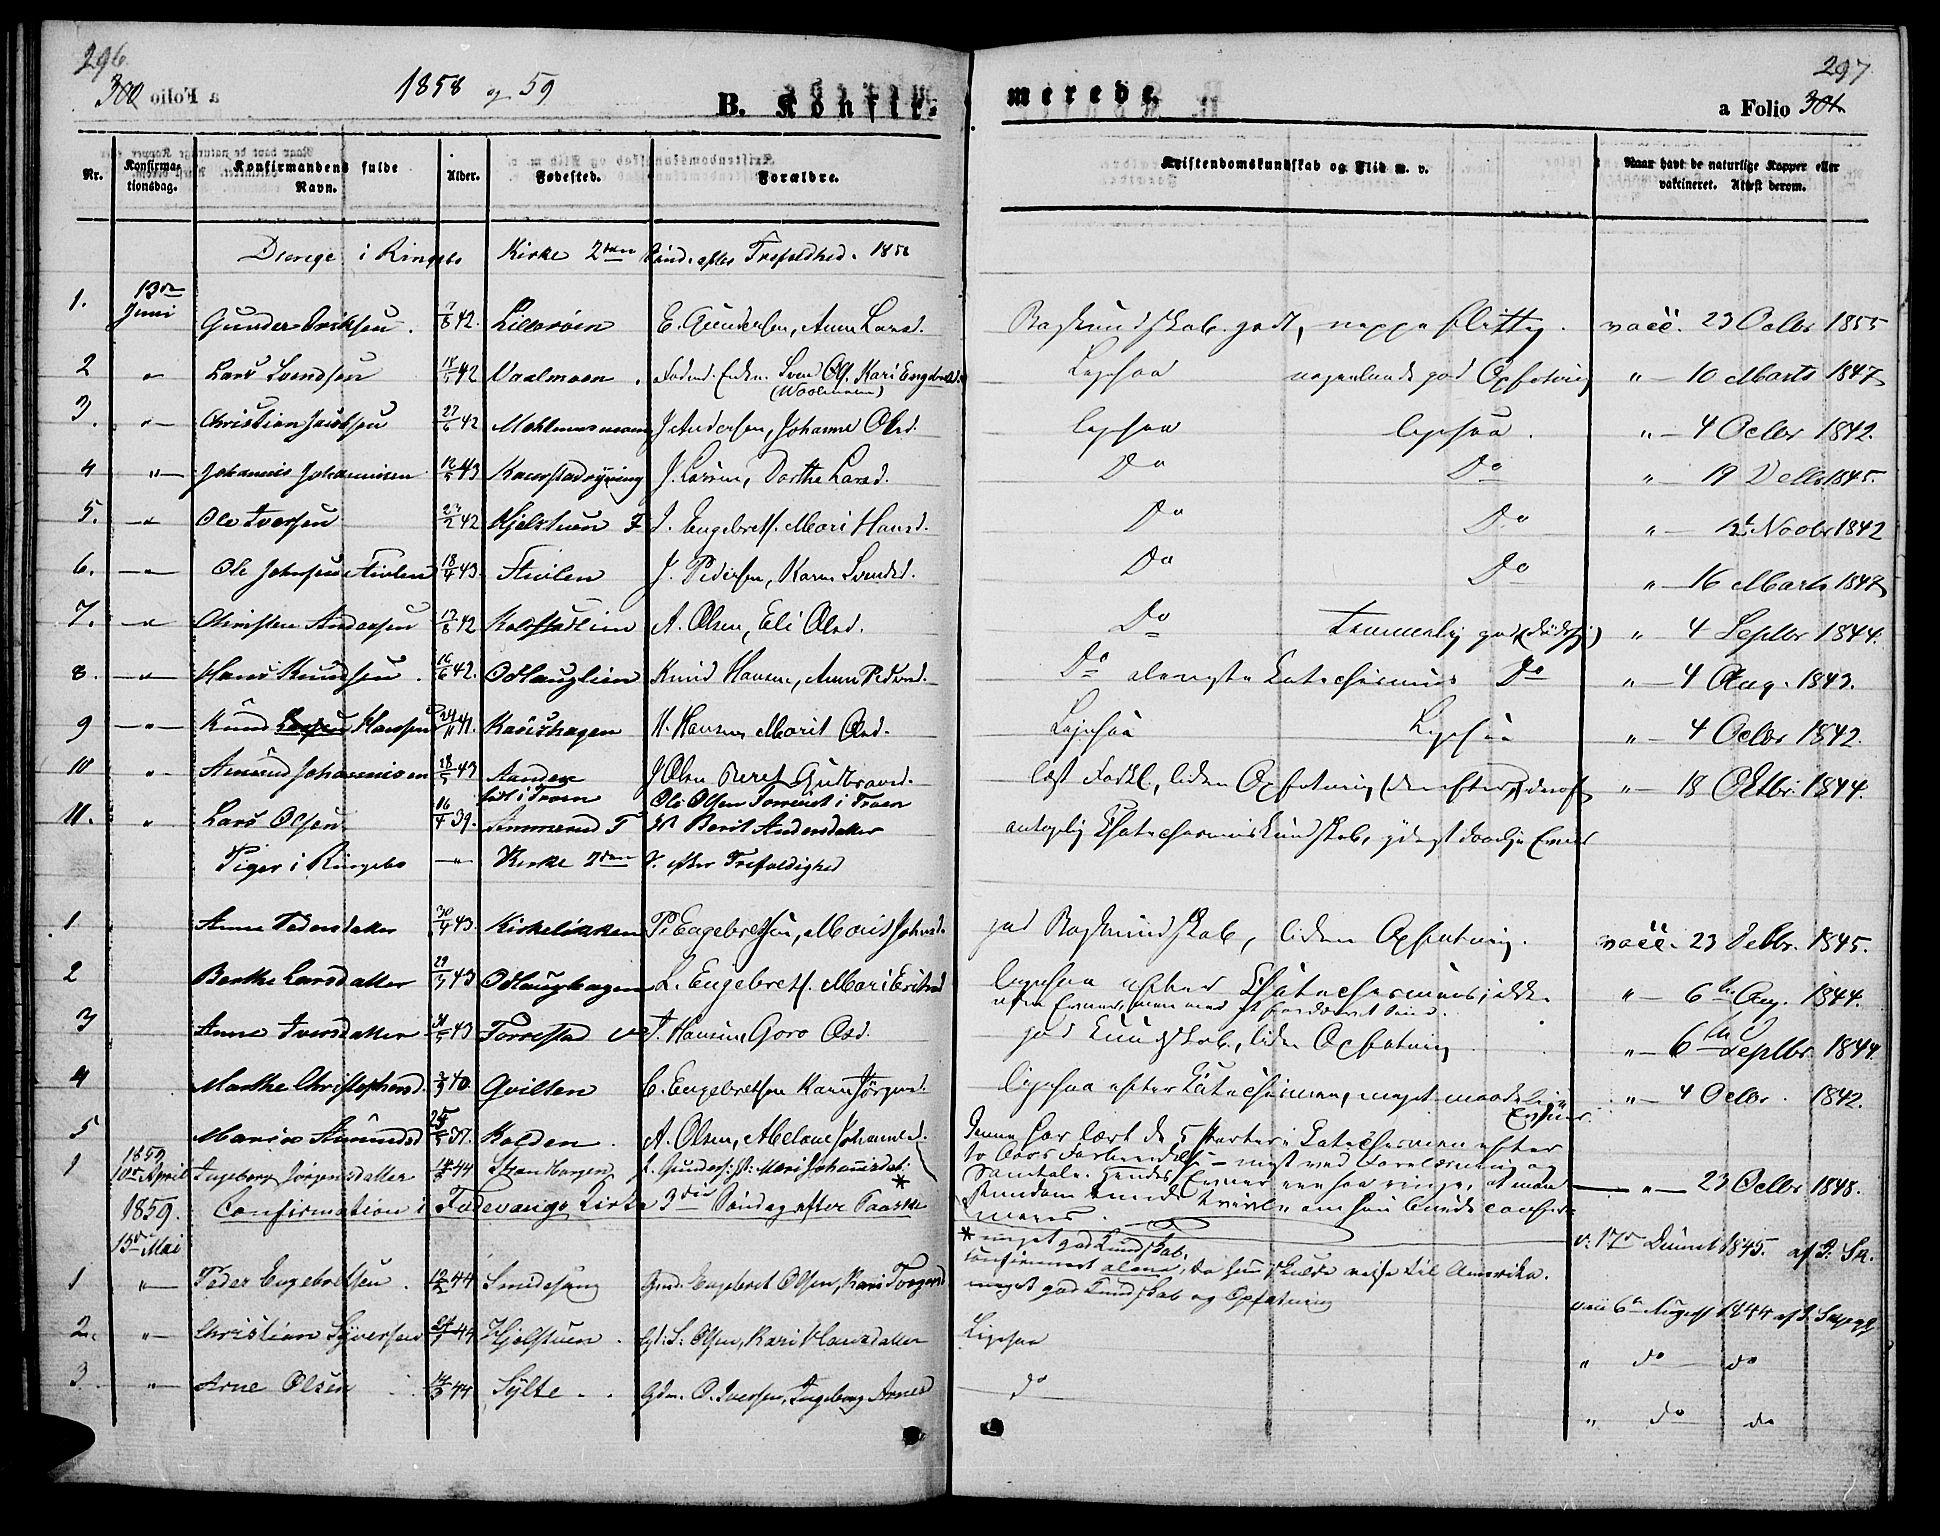 SAH, Ringebu prestekontor, Klokkerbok nr. 3, 1854-1866, s. 296-297